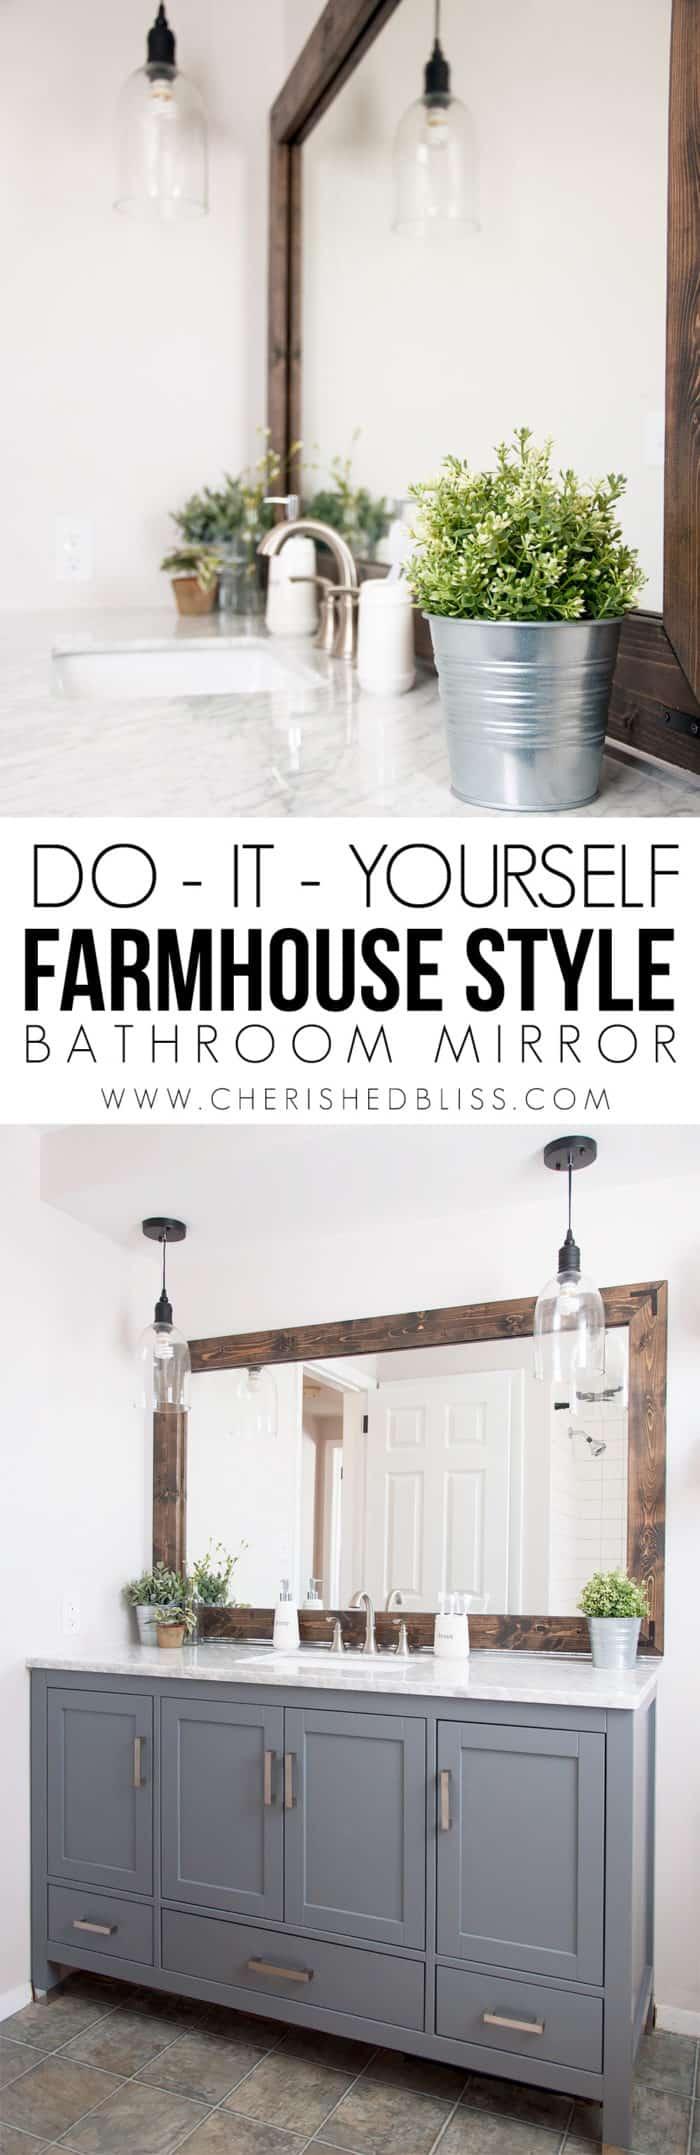 Grand miroir de salle de bain de style ferme bricolage